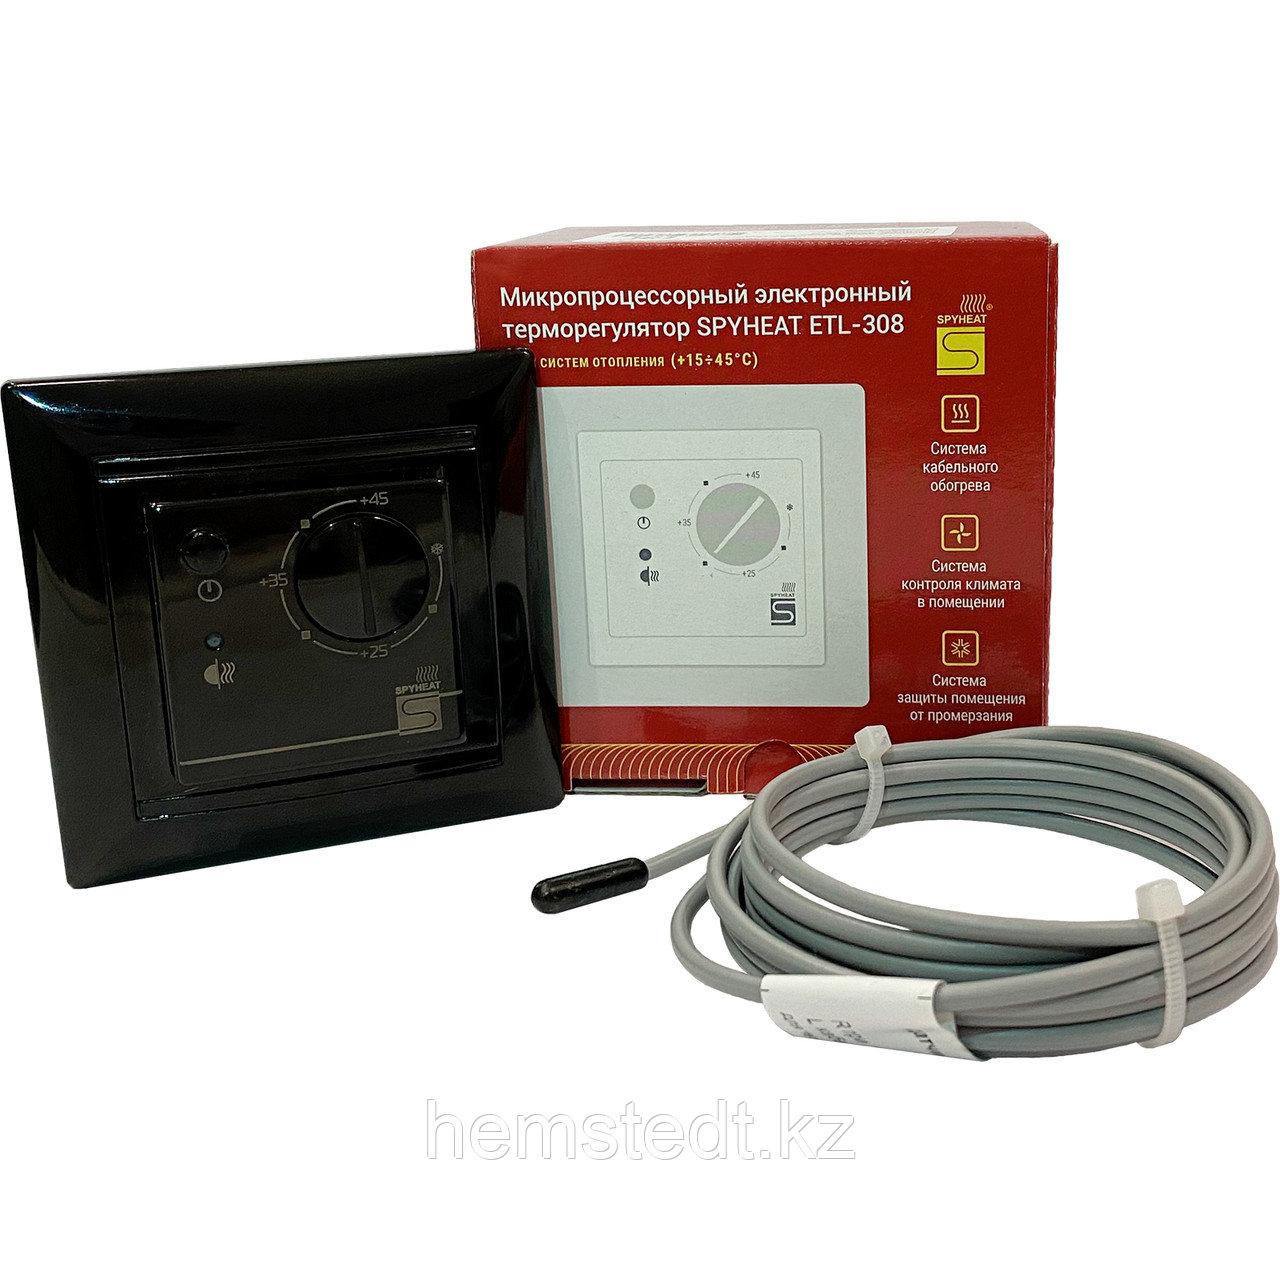 Терморегулятор ETL-308B черный